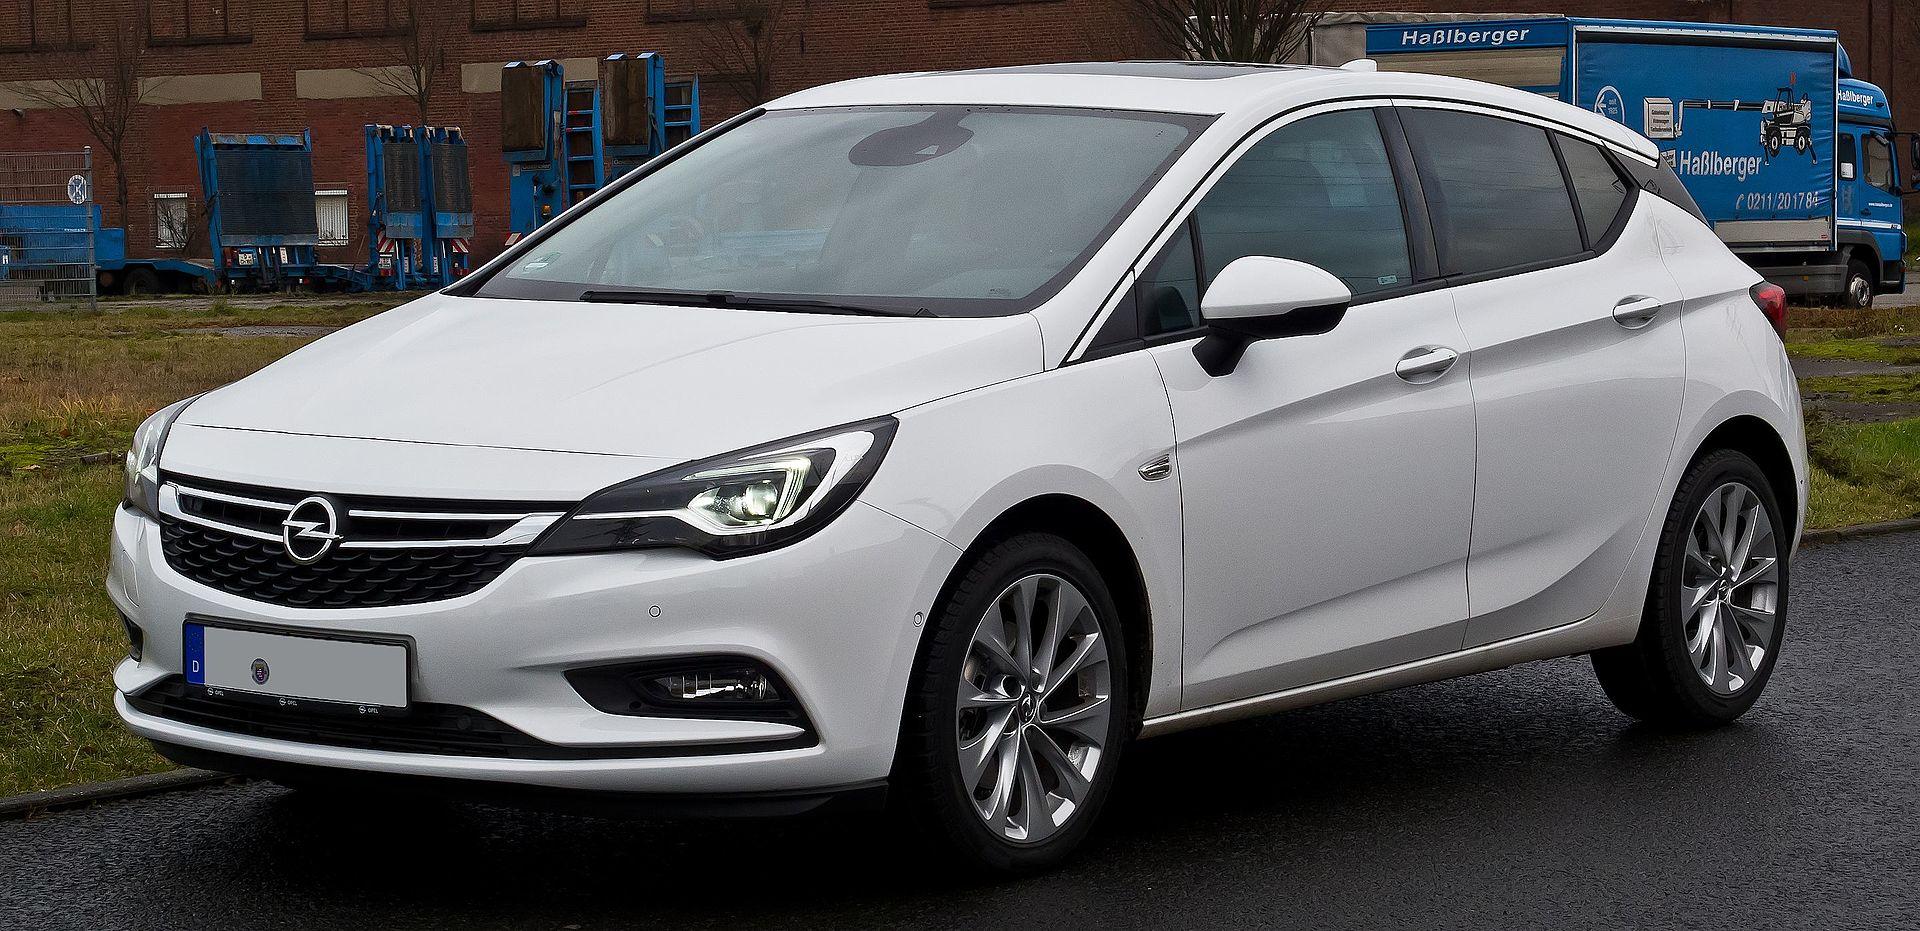 Opel Astra K Wikipedia